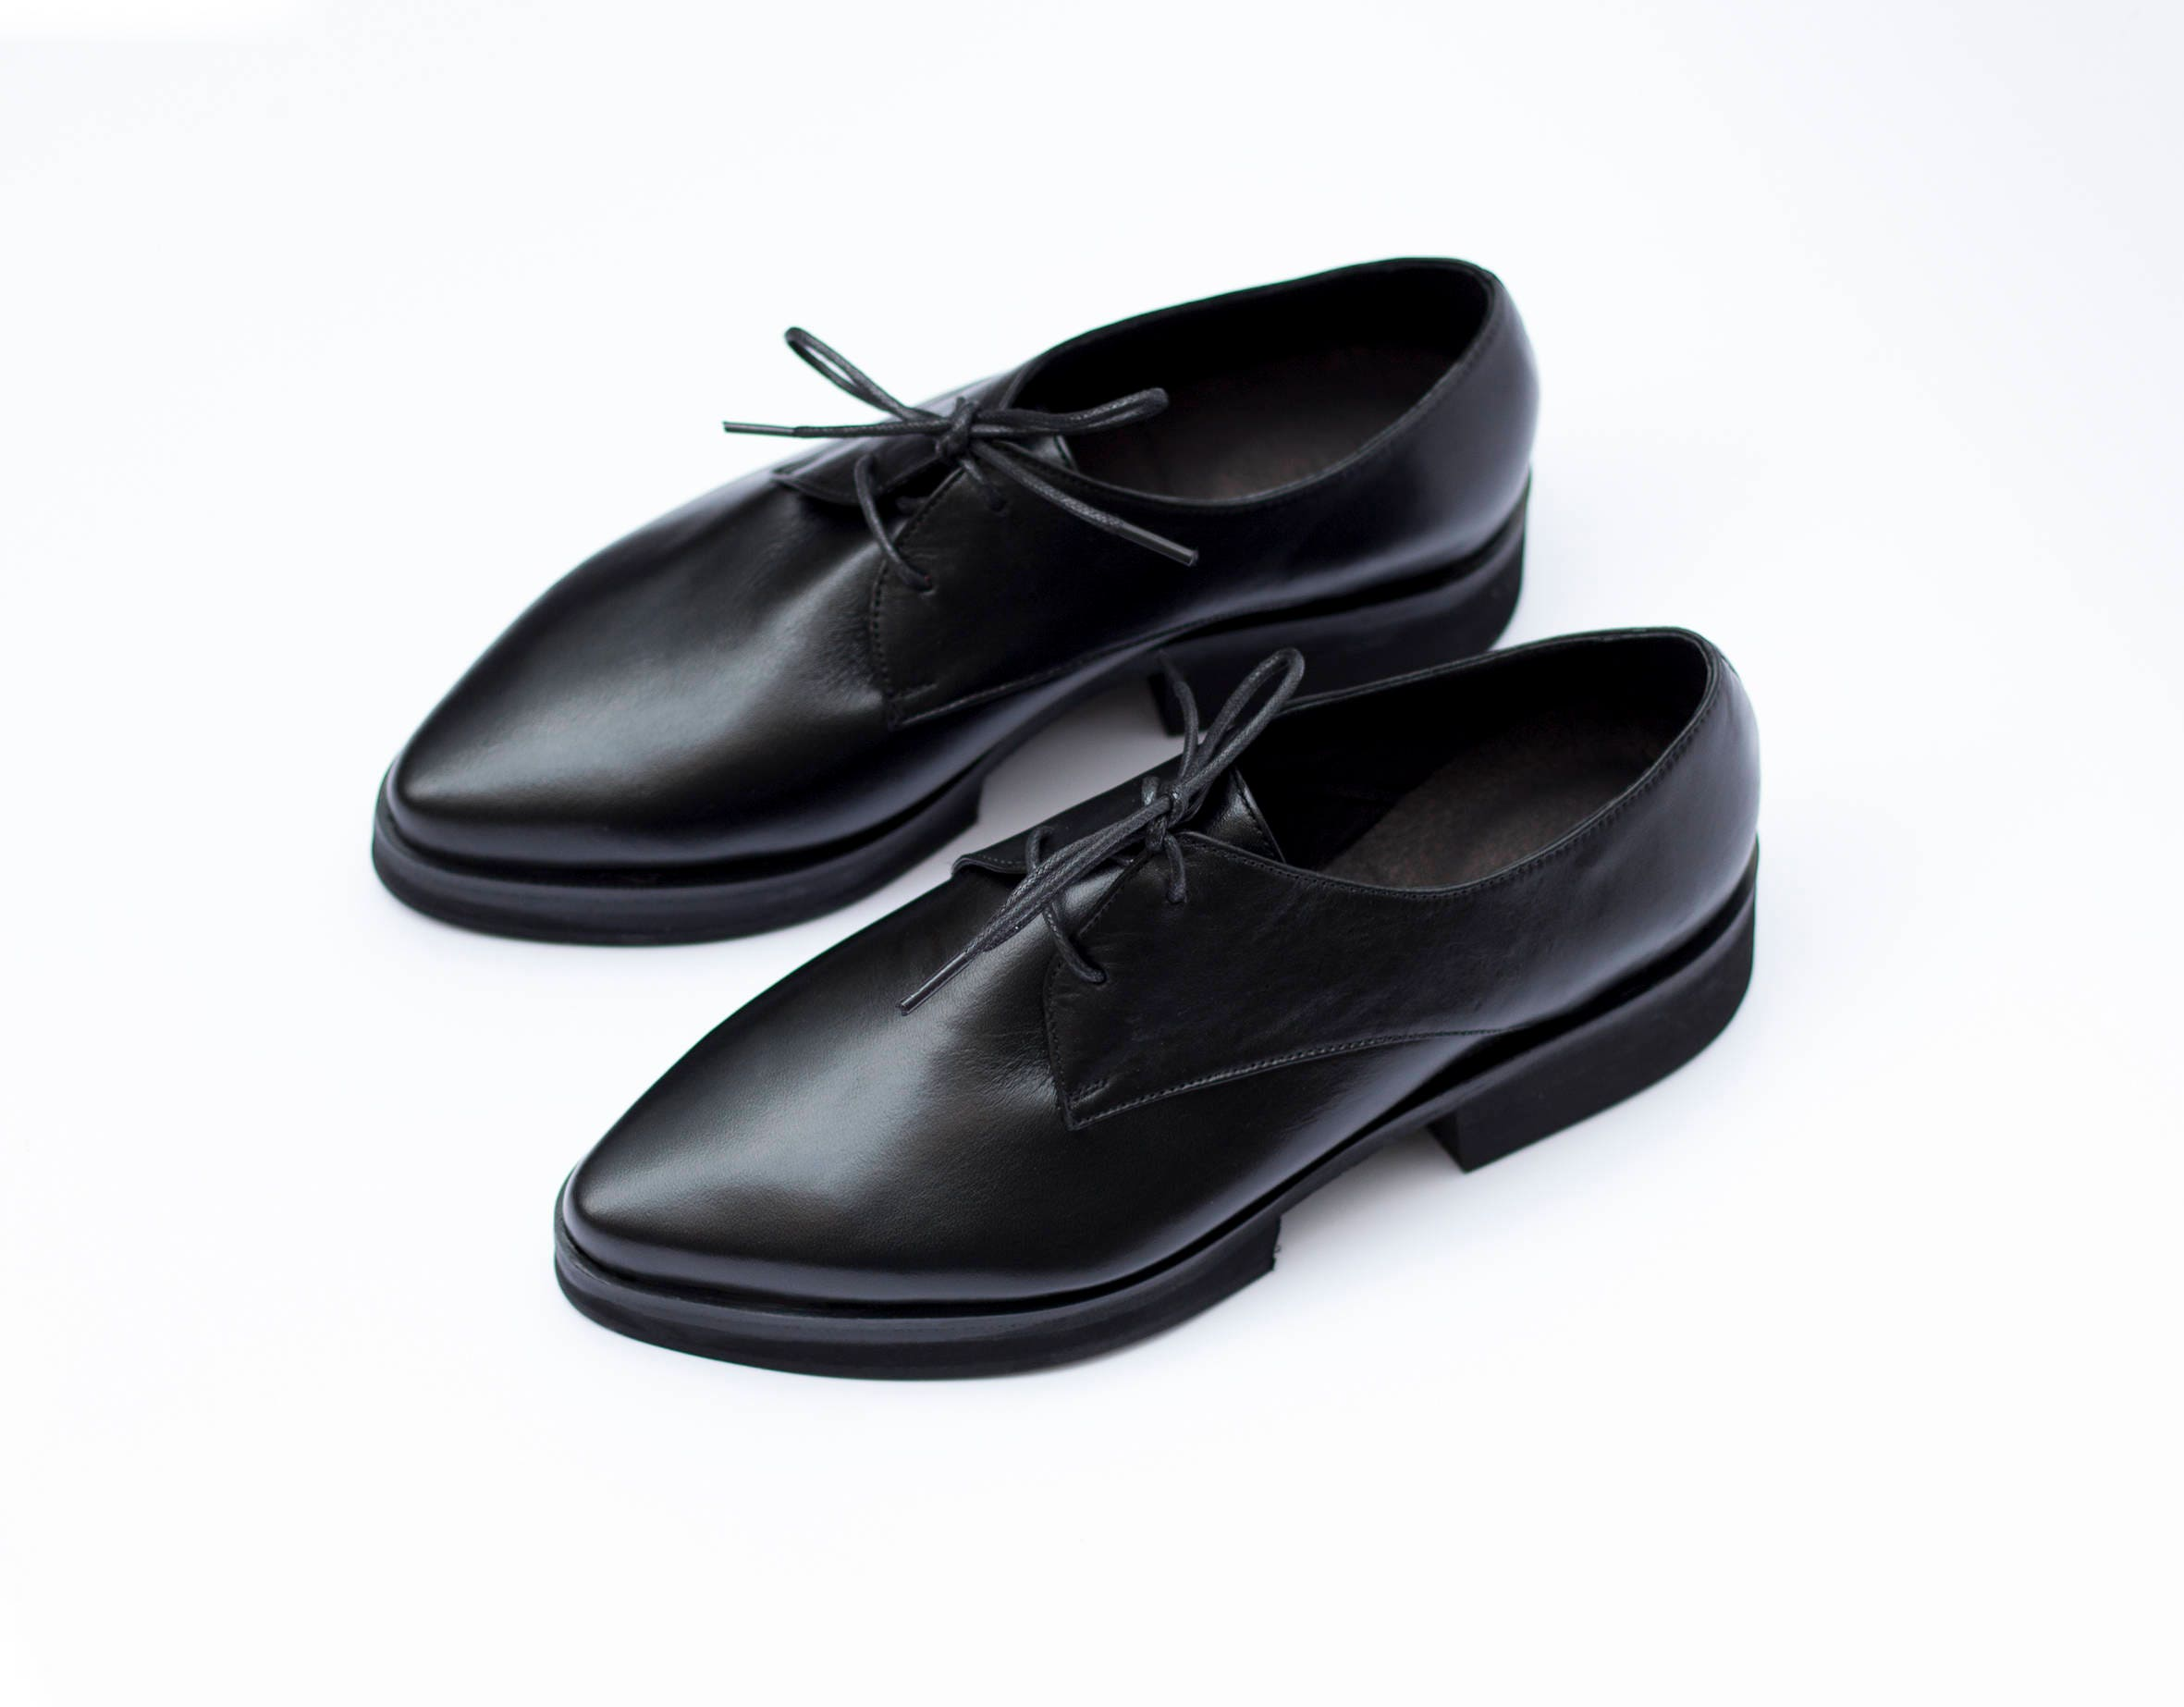 Black Leather Platform Heels Oxfords Stylish Pointy Shoes For  2bafa2670